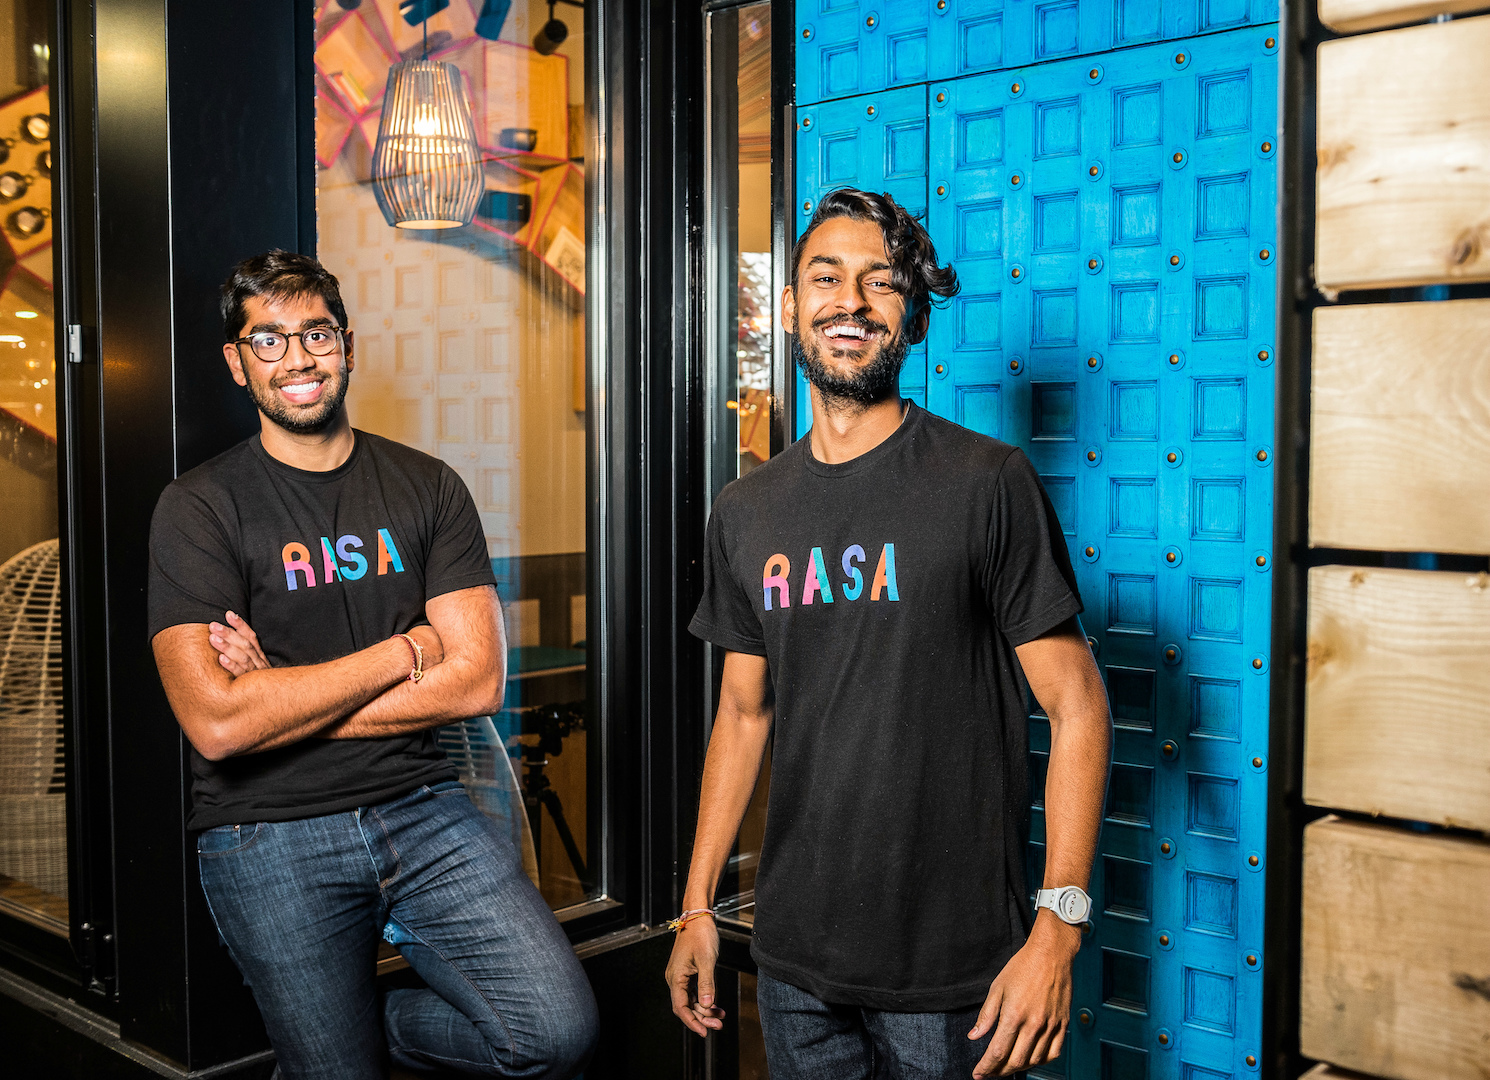 RASA Co Founders Rahul Vinod and Sahil Rahman. (Photo by Rey Lopez)